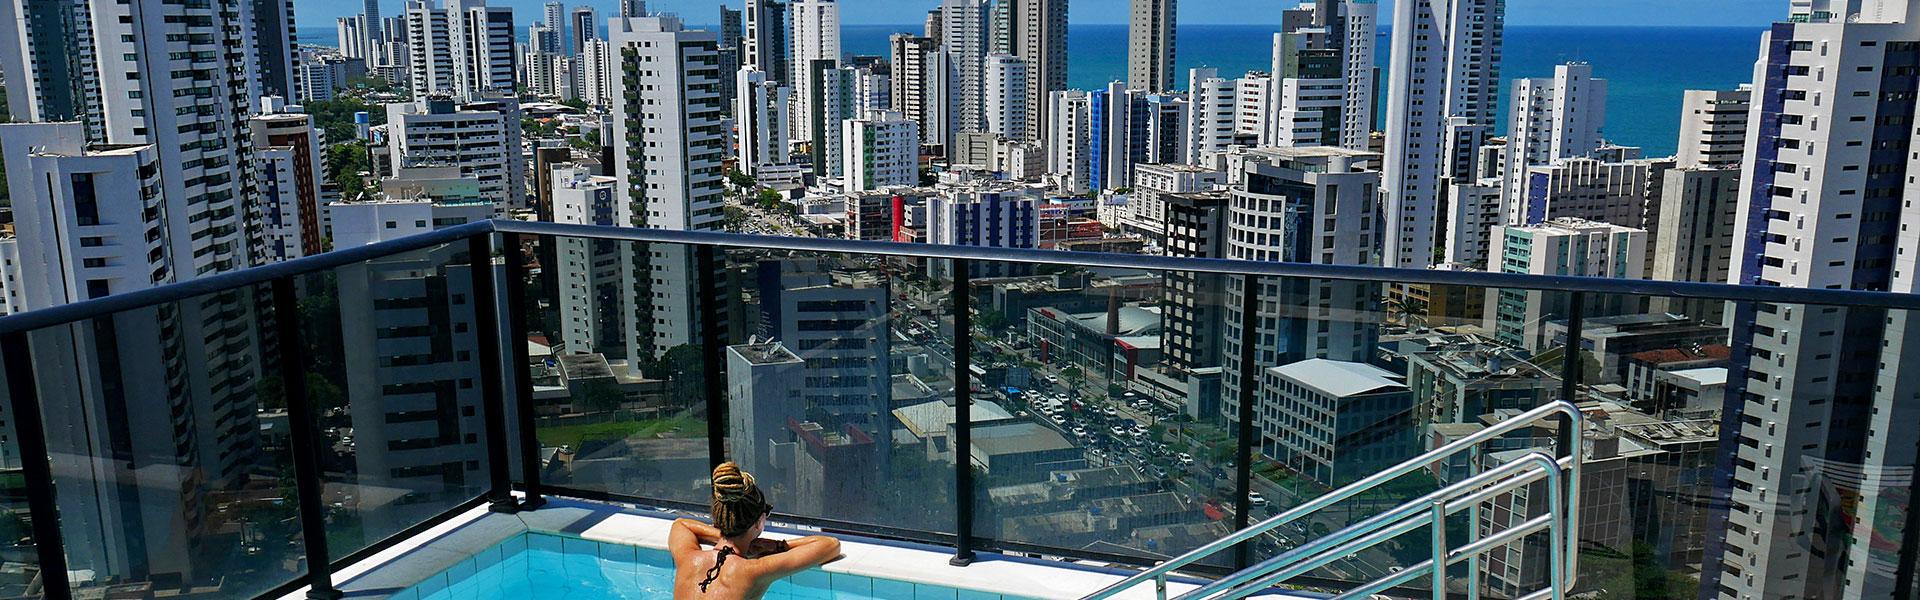 Rasta girl in Airbnb rooftop pool overlooking the city and ocean in Recife, Brazil